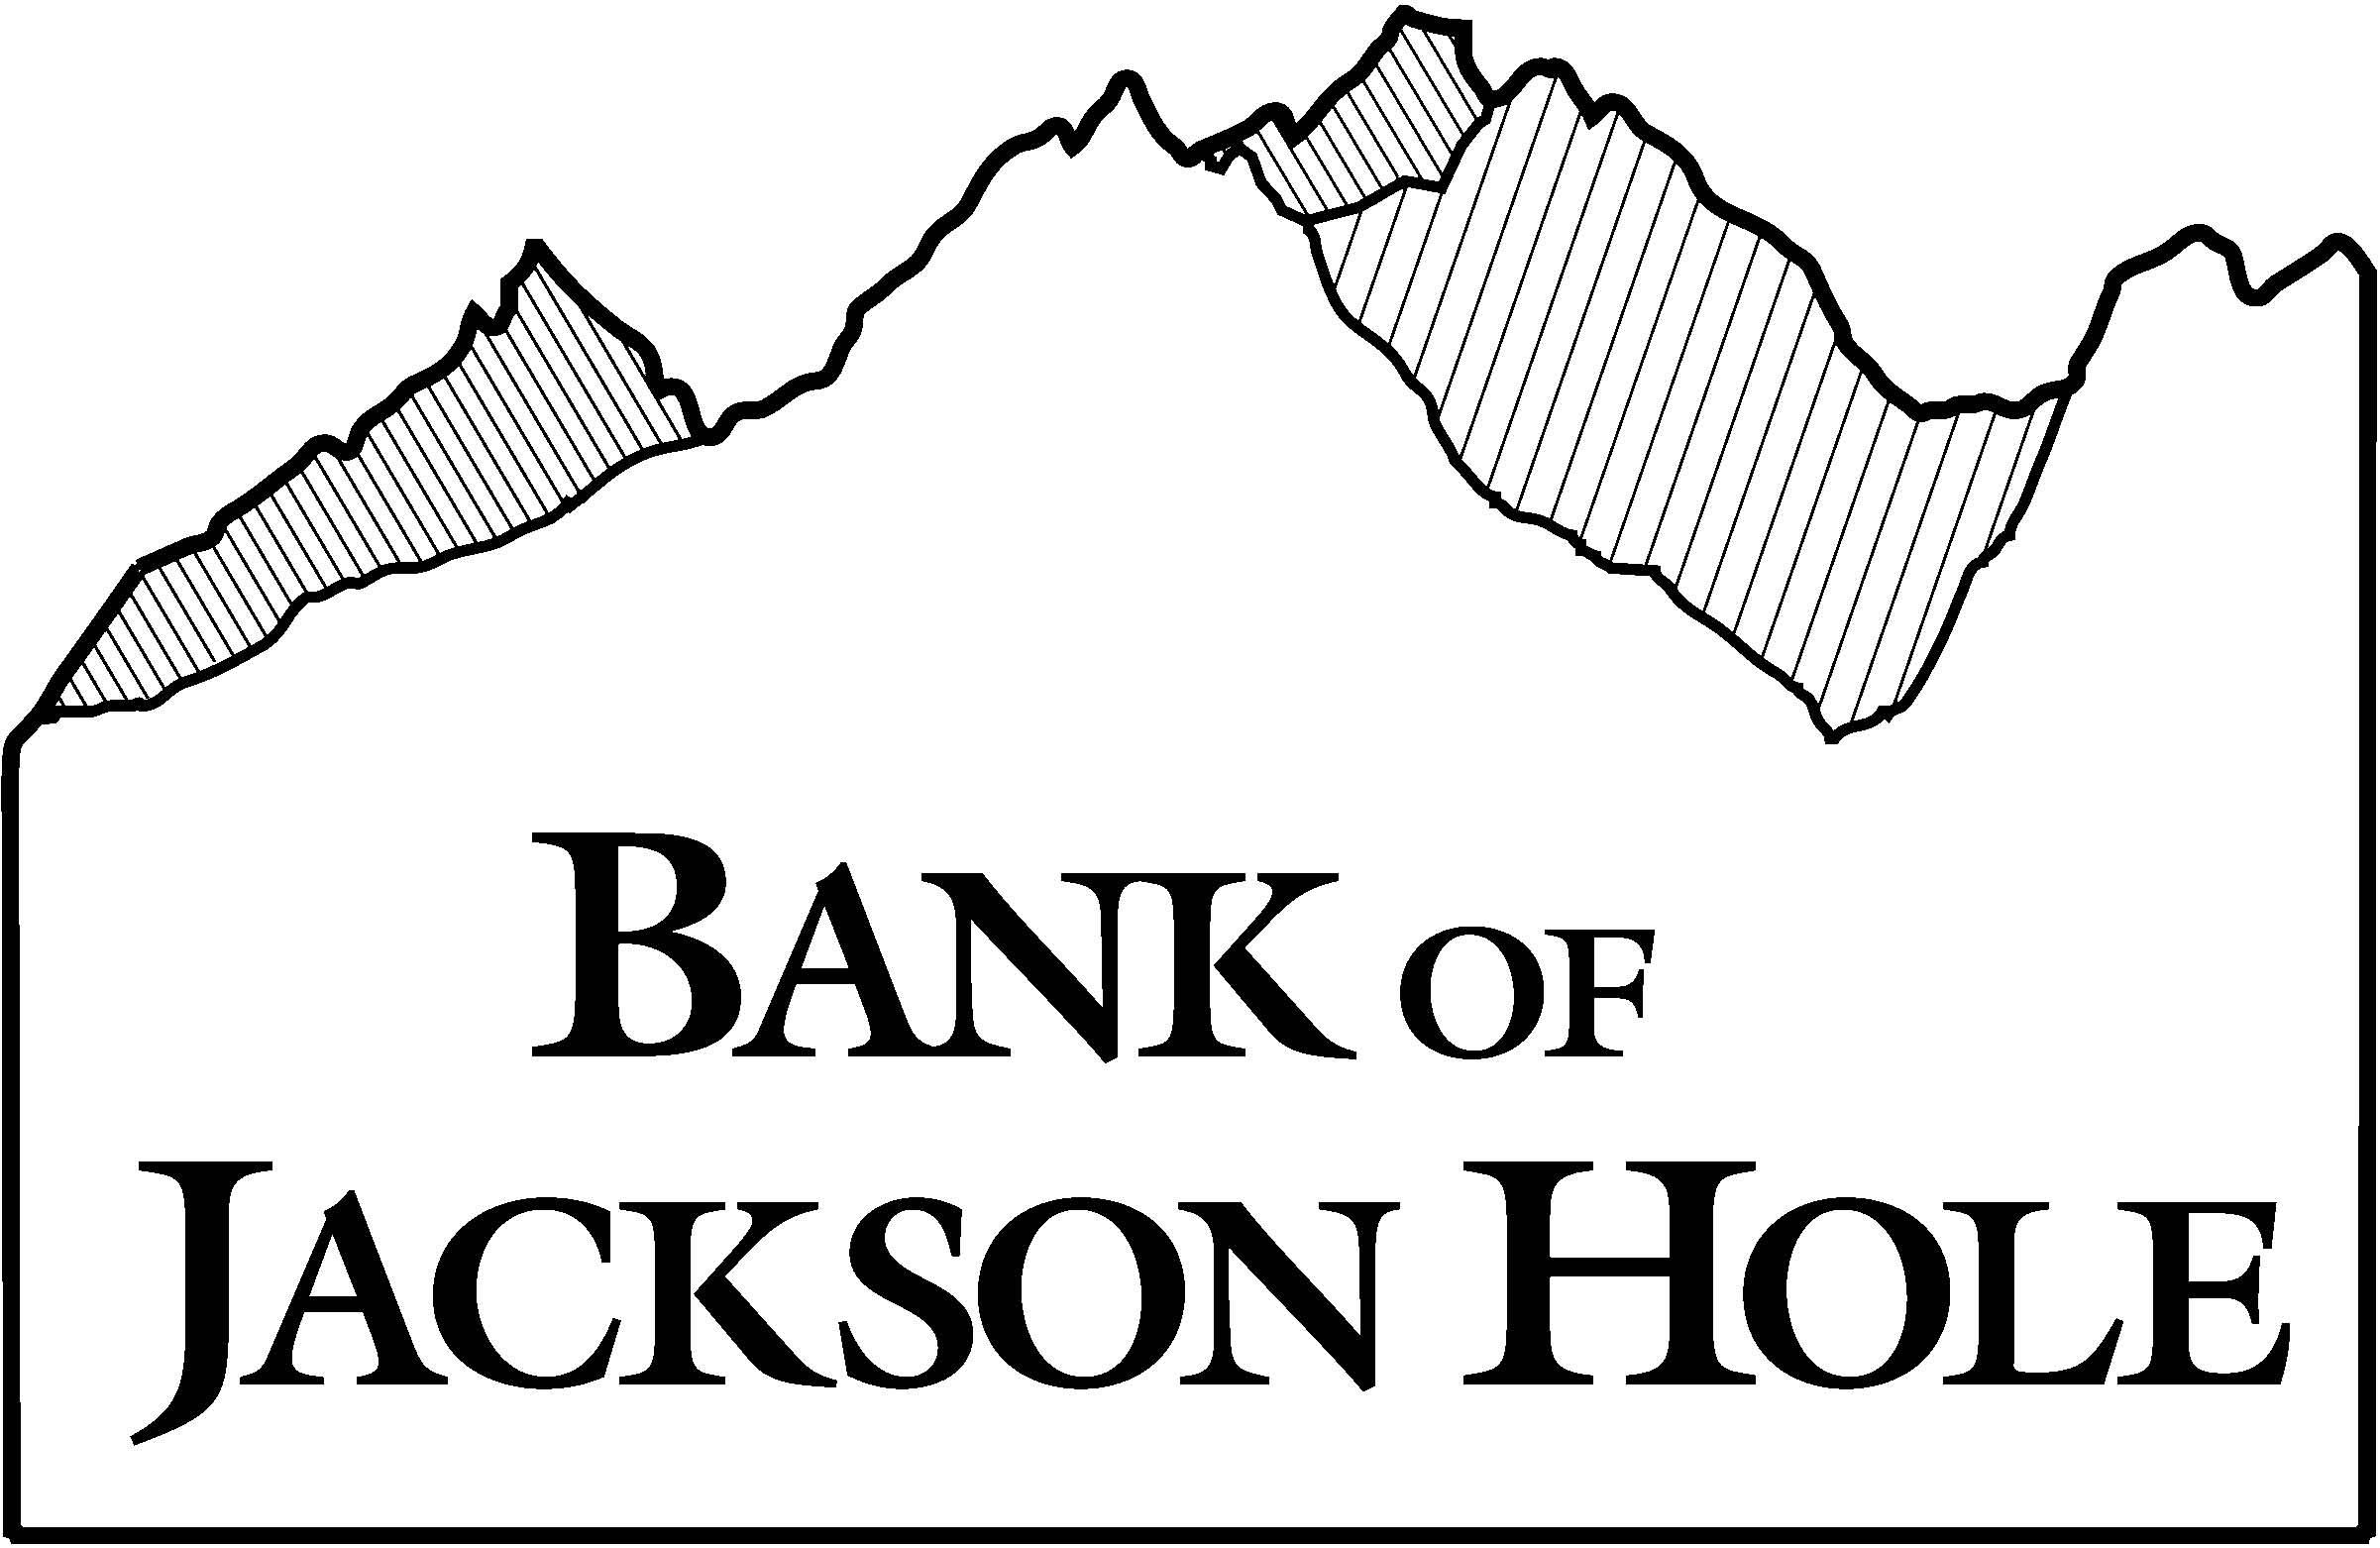 Bank of Jackson Hole.jpg